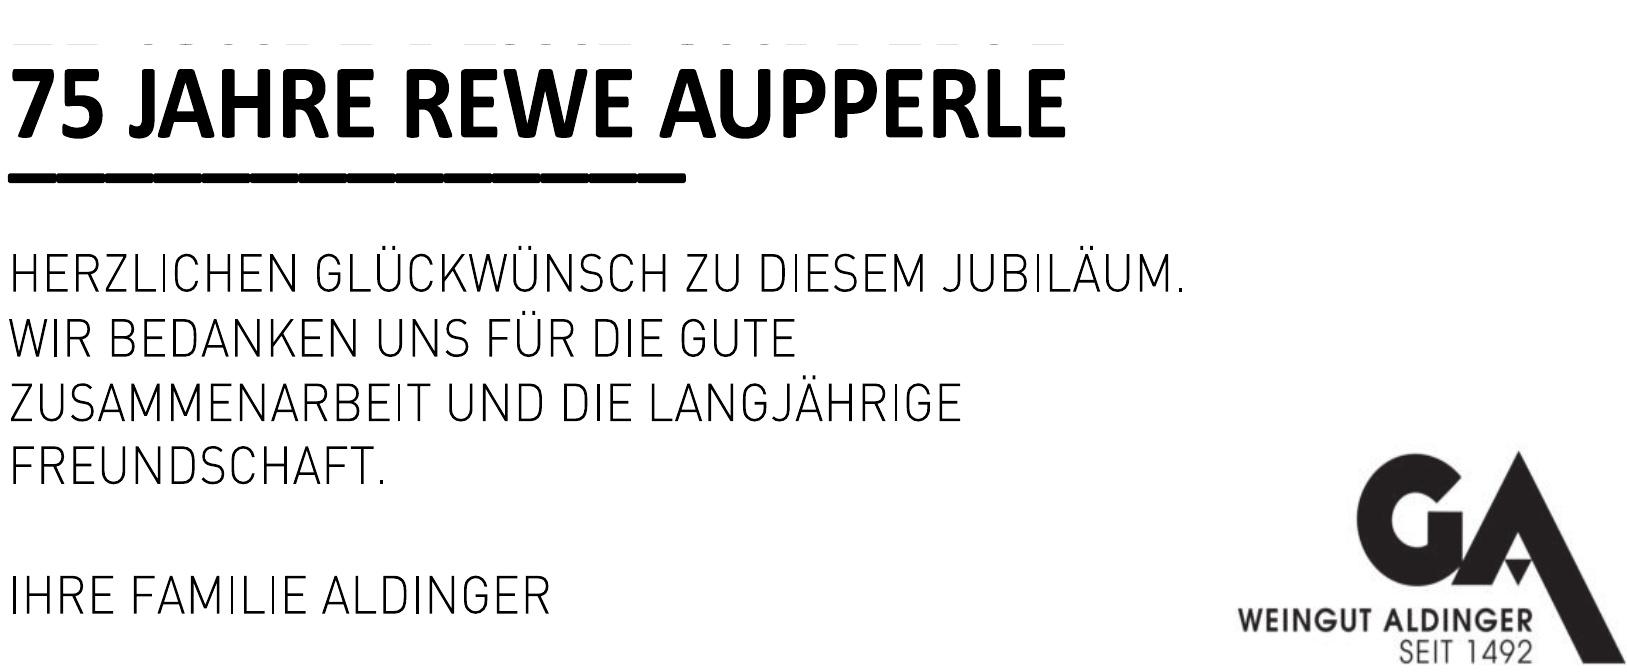 GA Weingut Aldinger